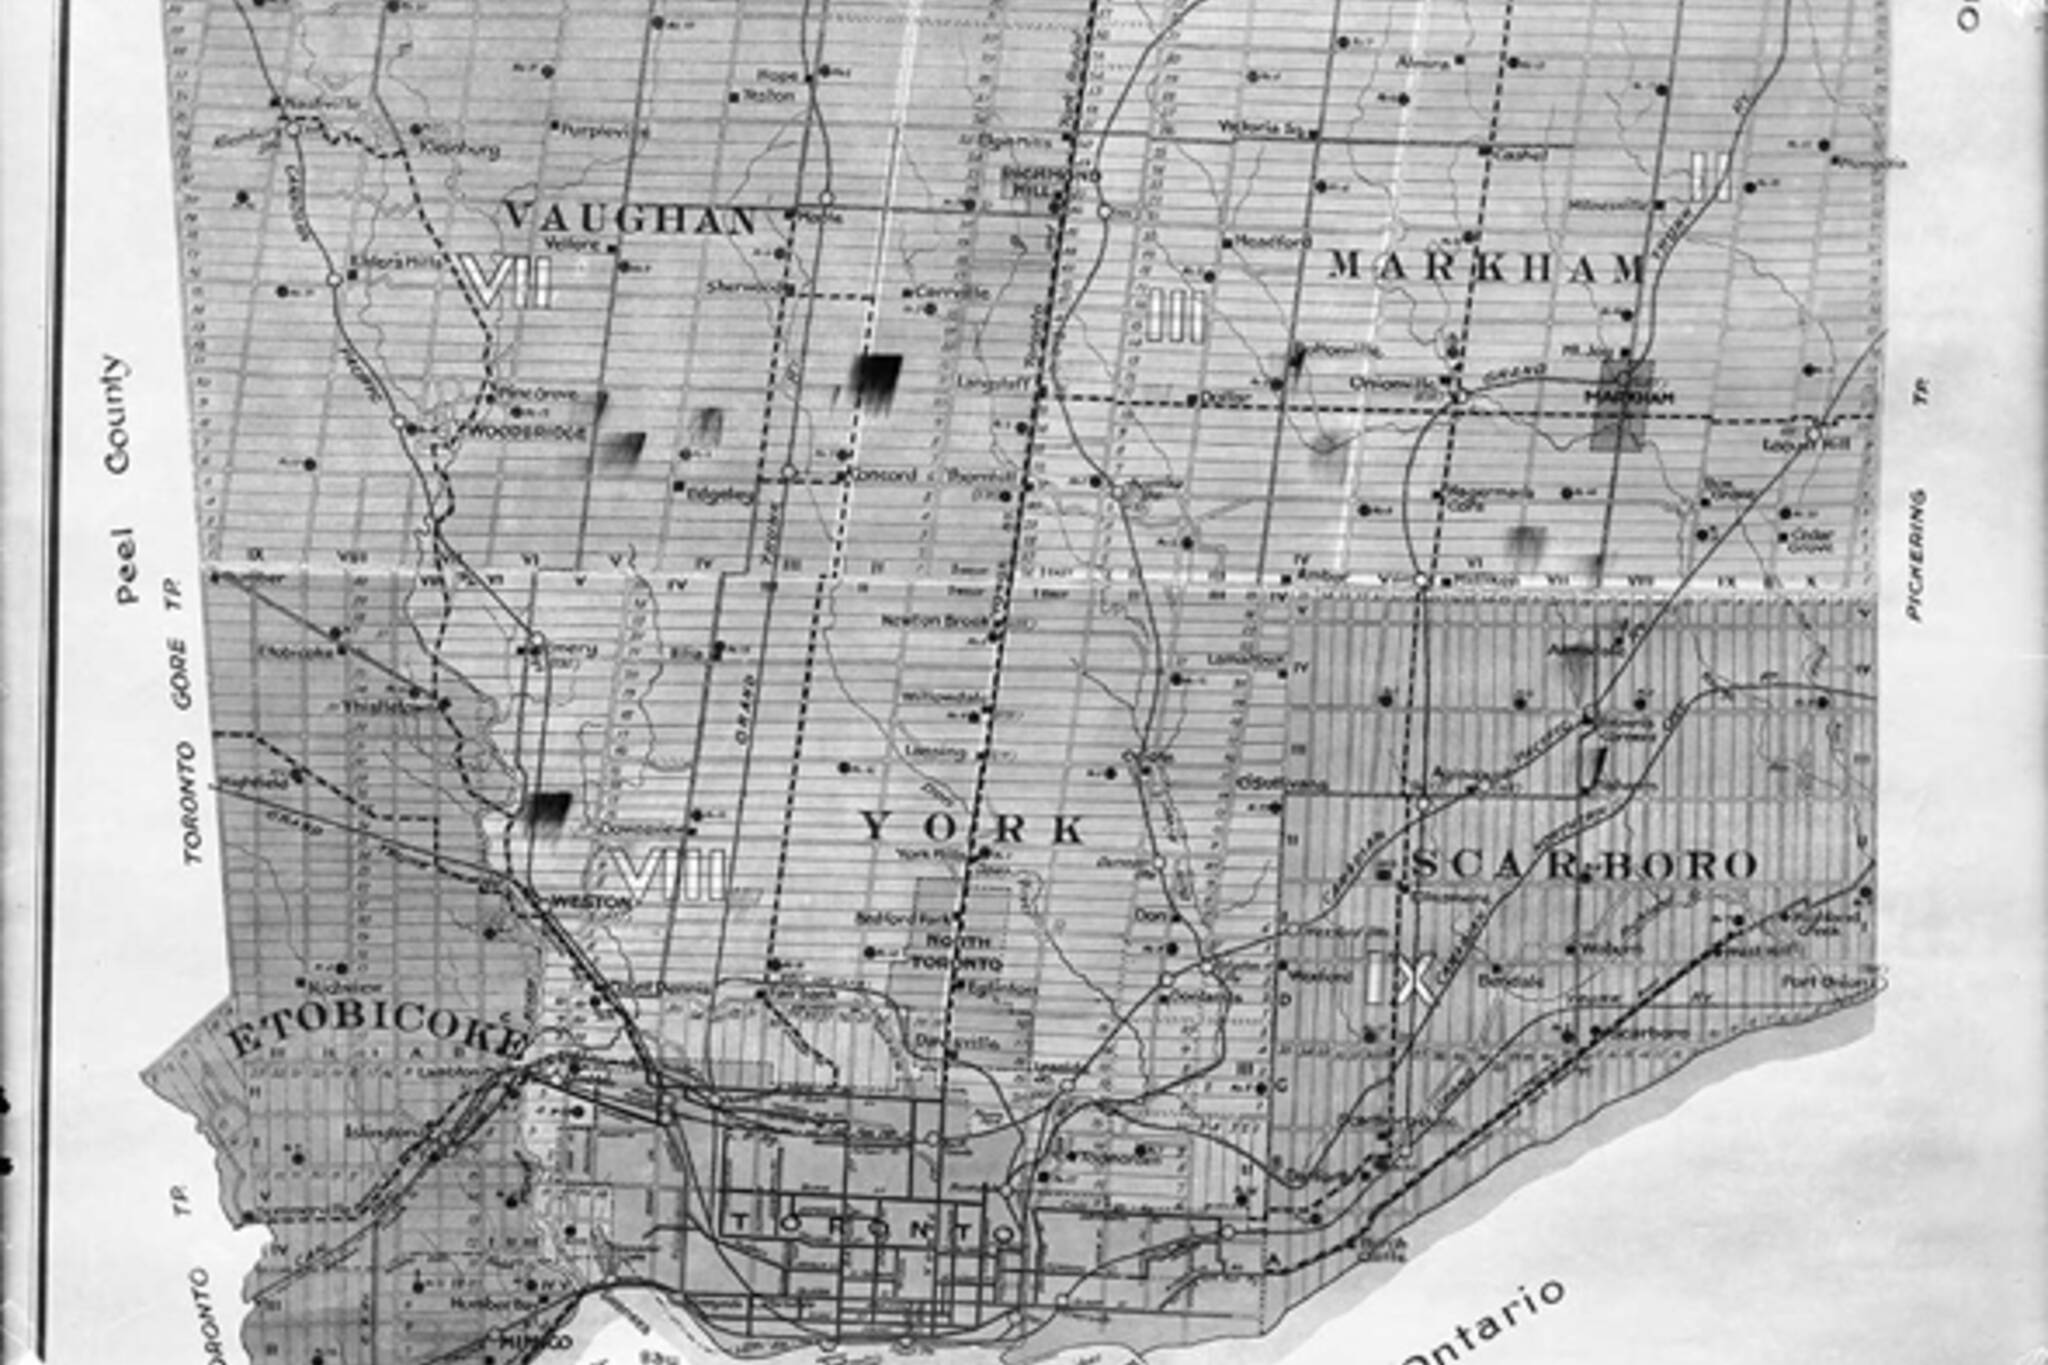 Toronto, history, neighbourhoods, Brockton, Ellesmere, Scarborough, postwar, suburbs, York County